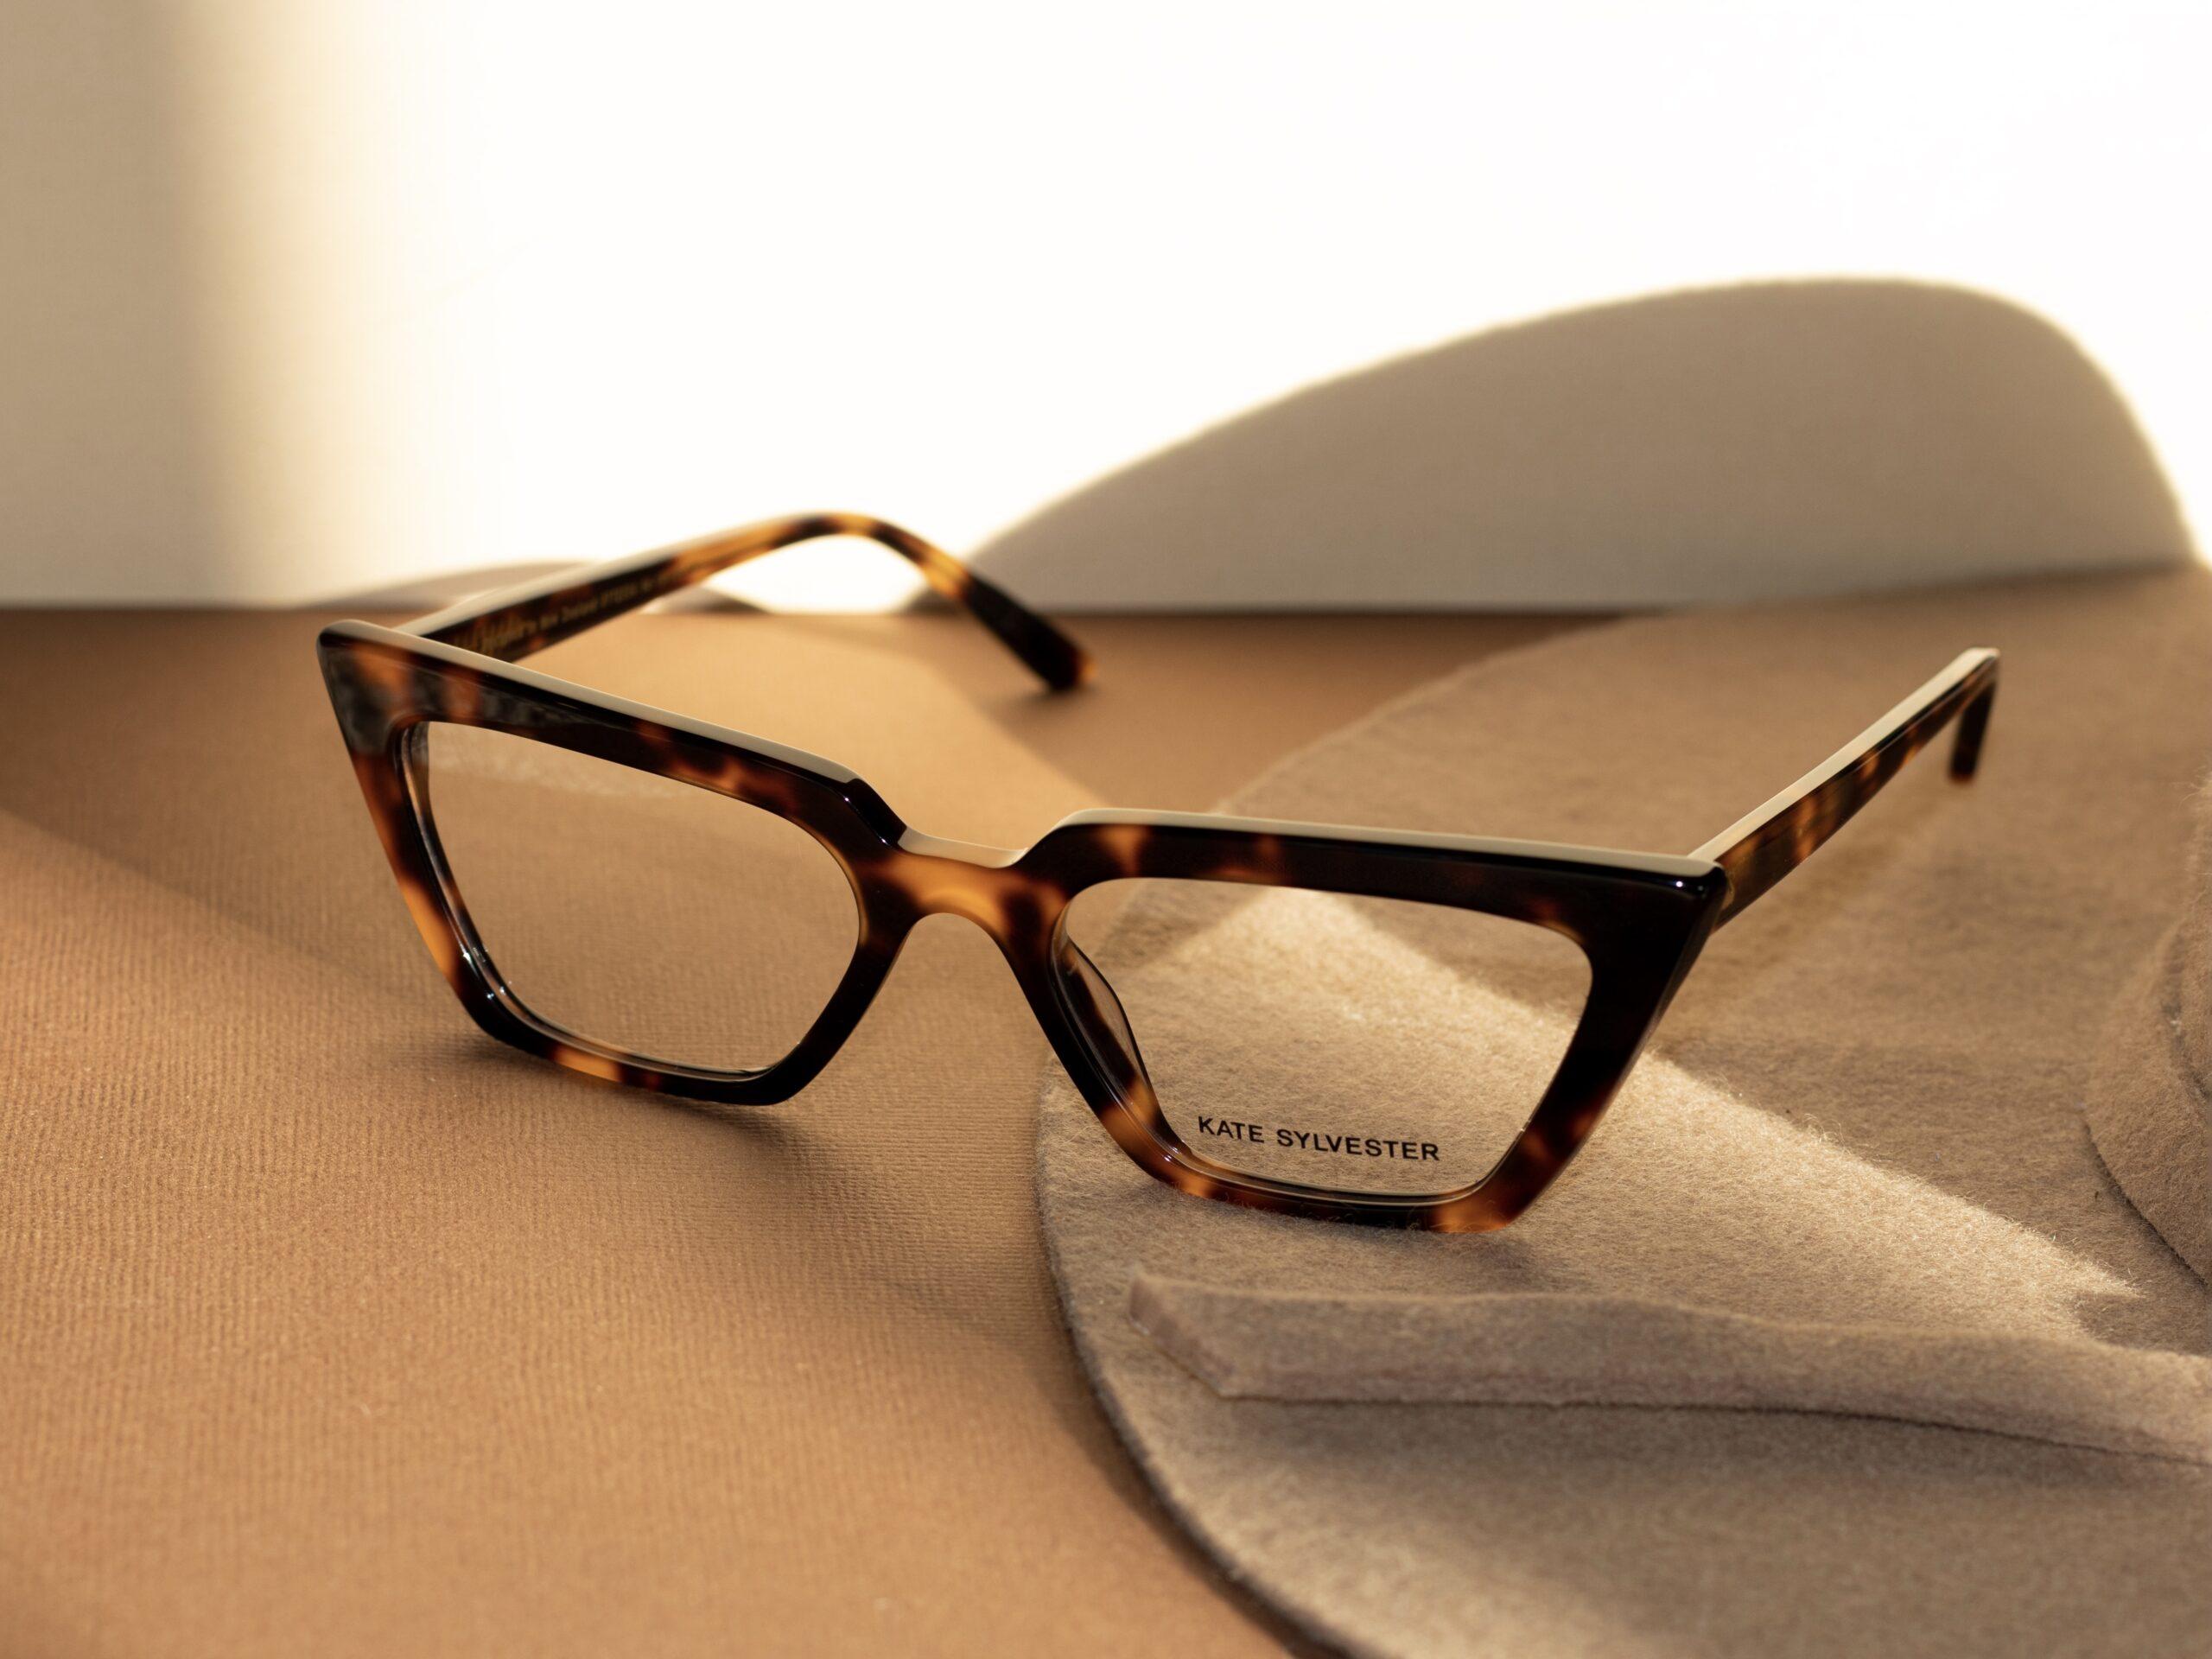 Kate Sylvester eyewear glasses